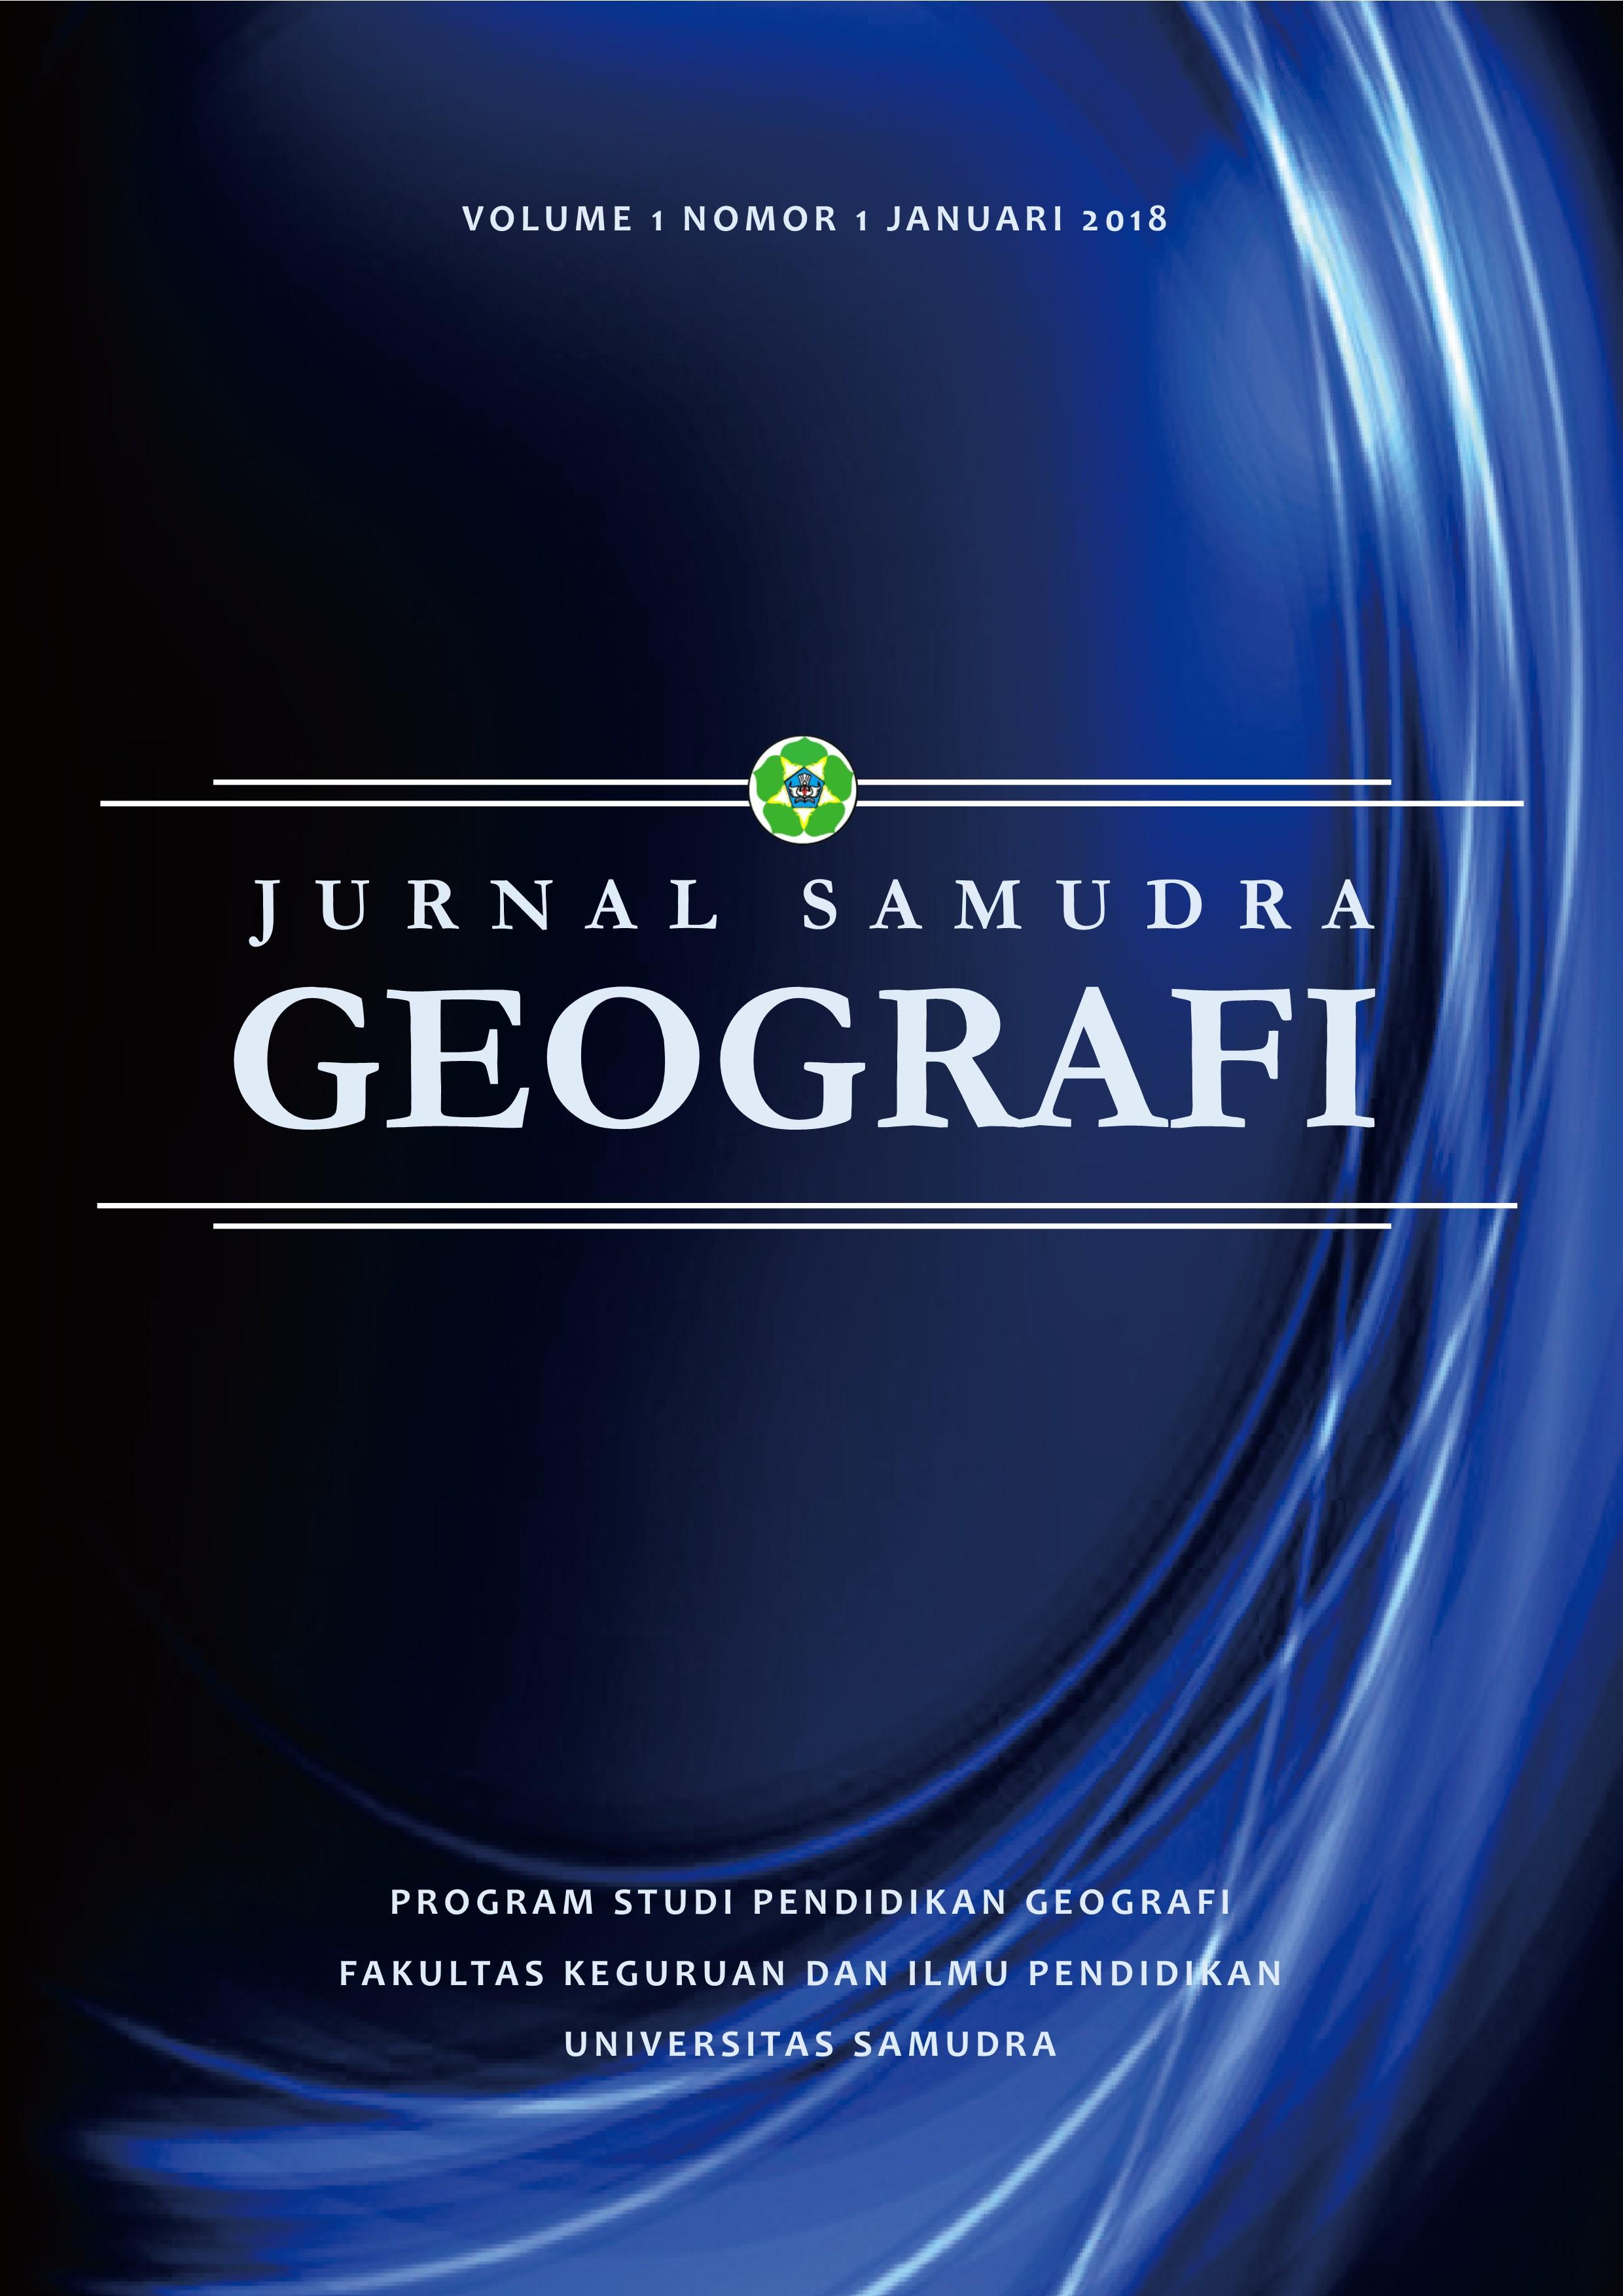 Jurnal Samudra Geografi